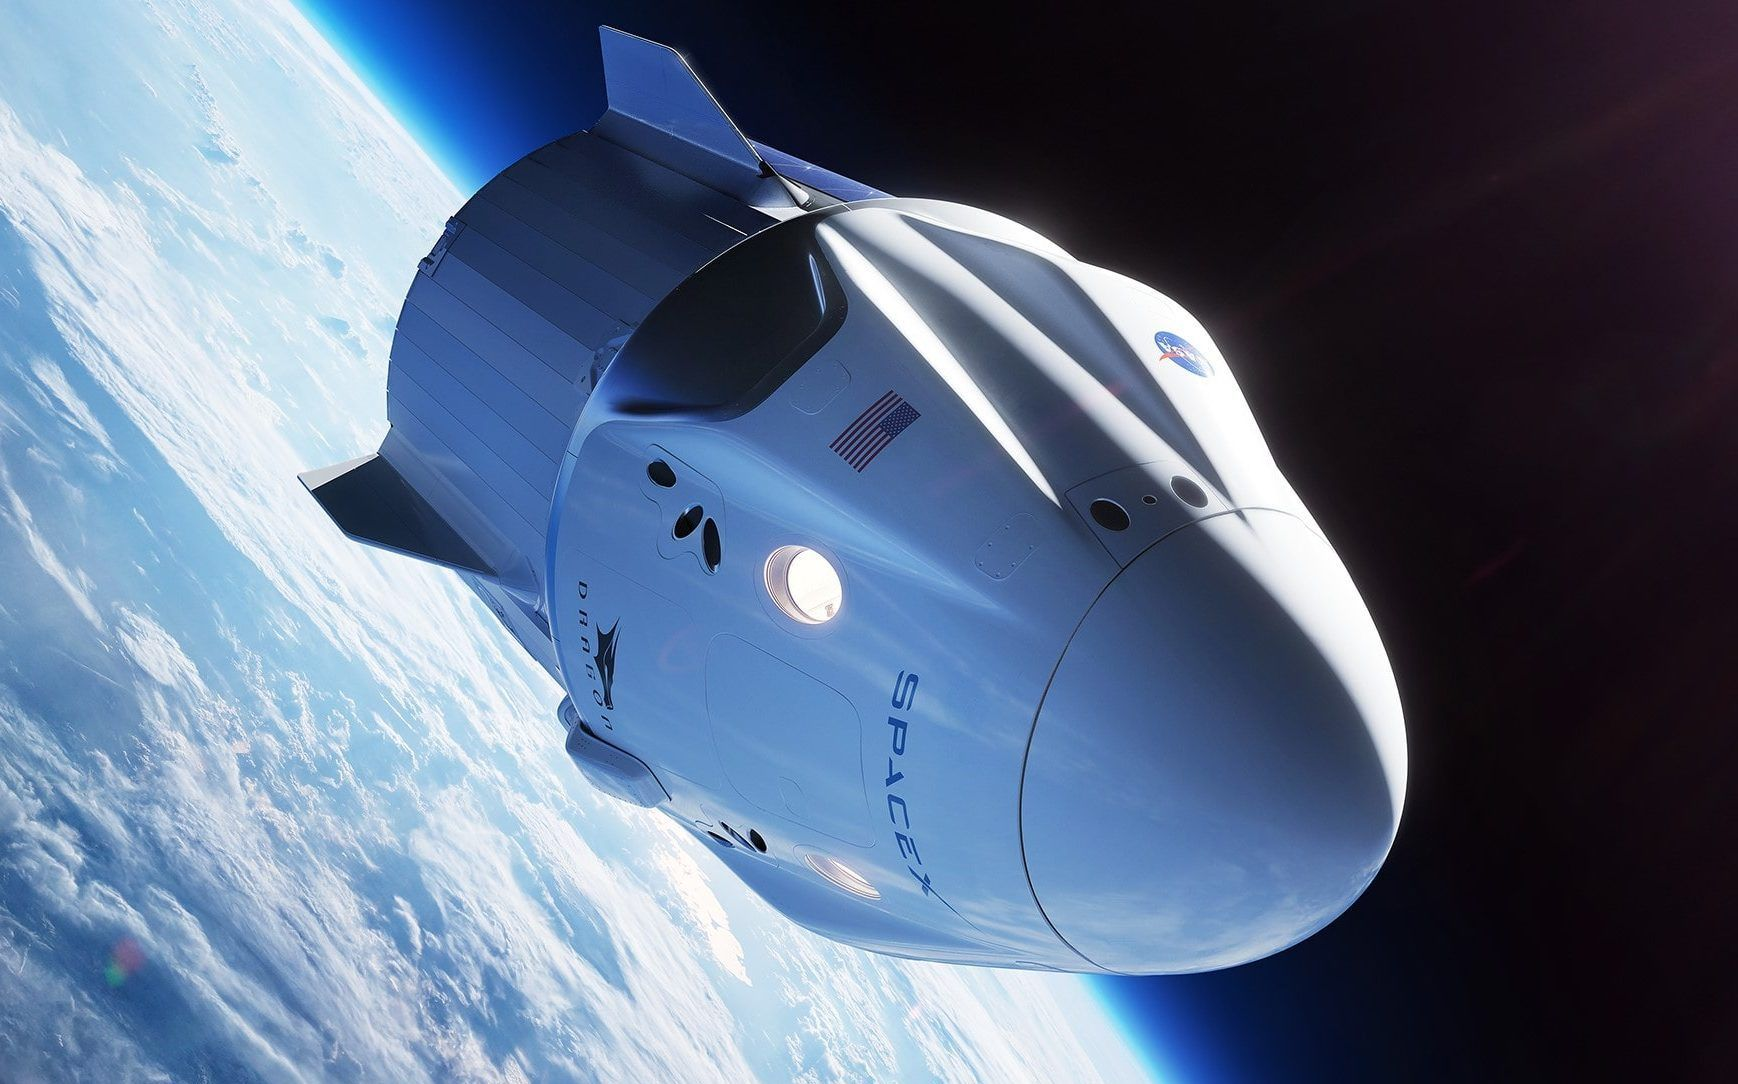 Crew-2宇航员将重新安置龙飞船,以迎接波音Starliner对接空间站